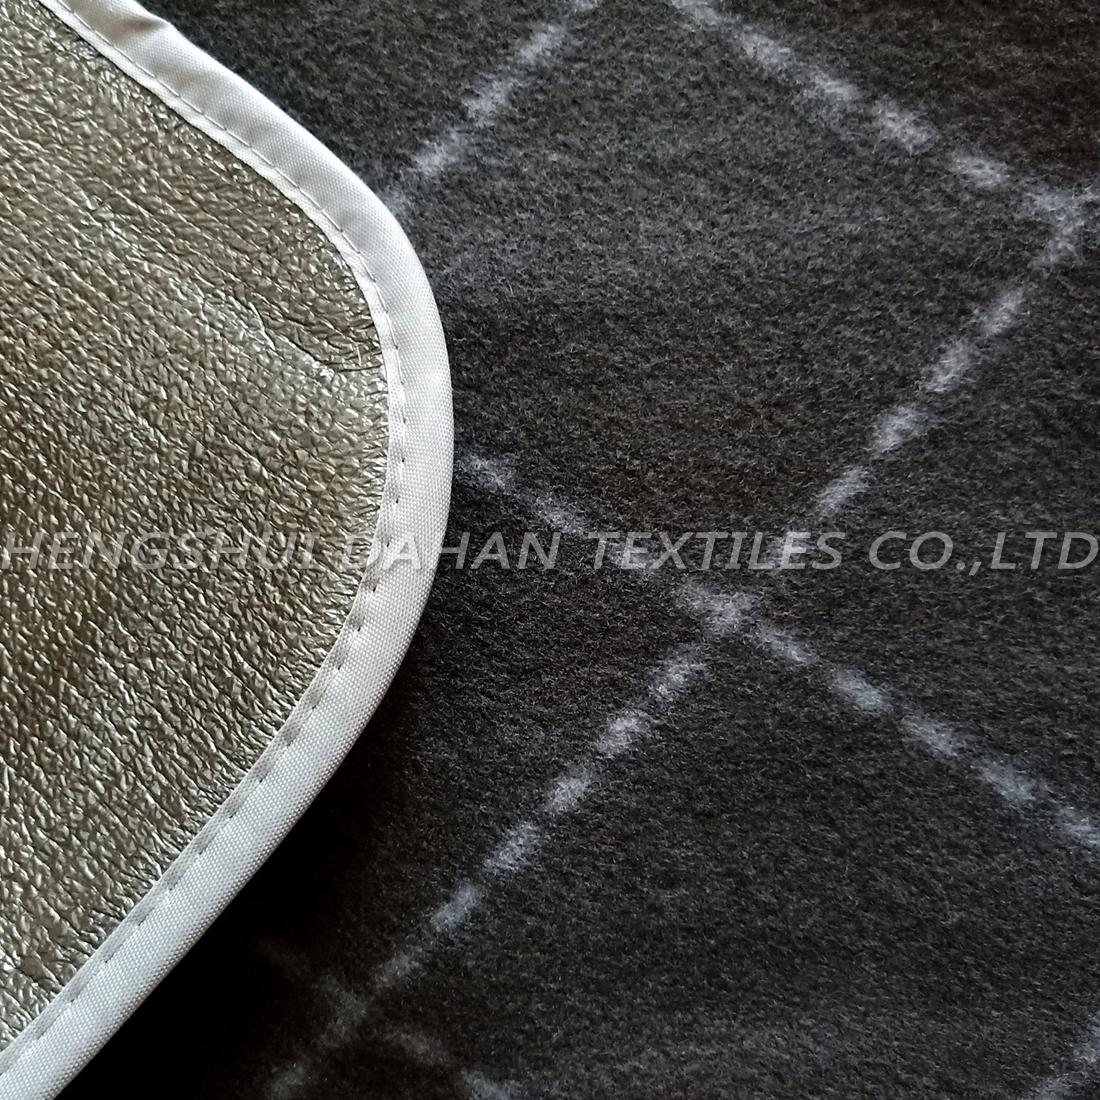 Picnic blanket waterproof picnic mat with printing.PM10